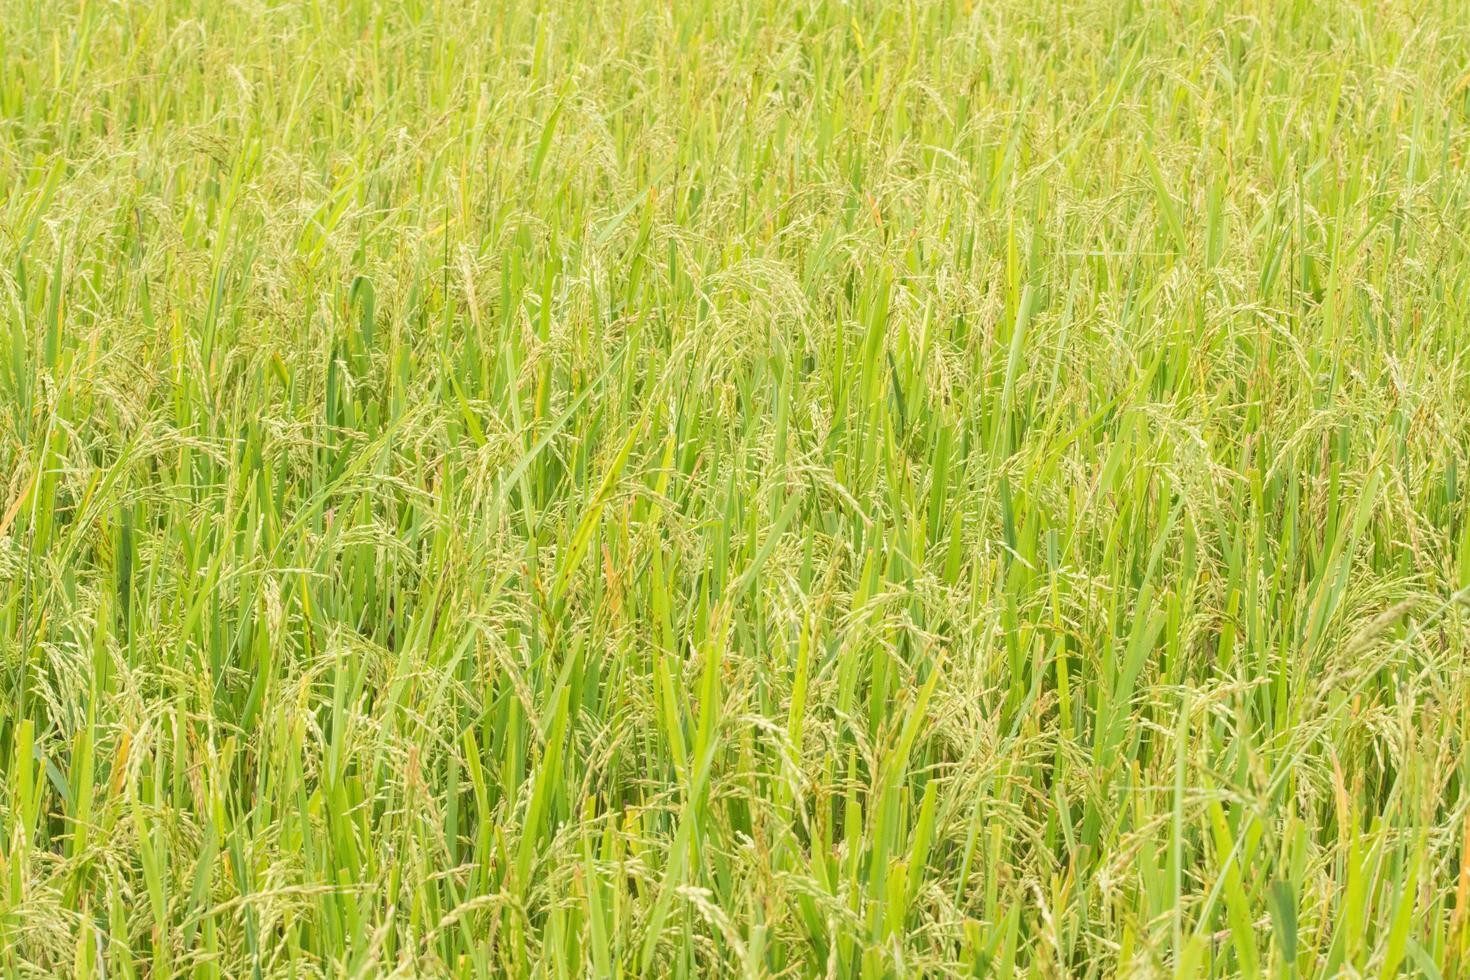 fond de champ de riz vert frais photo